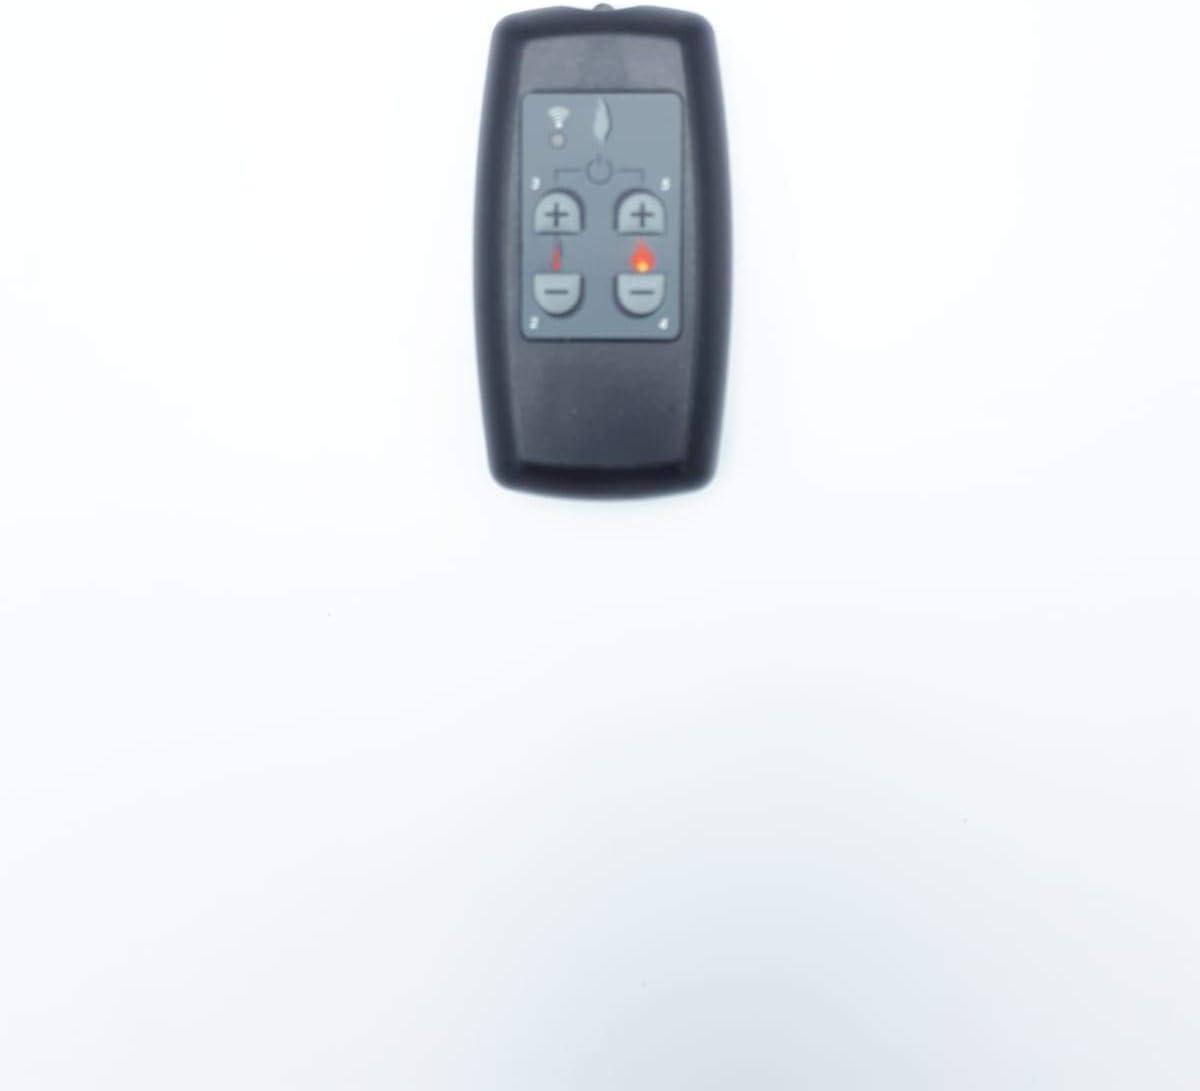 Mando estufa pellet Nordica Extraflame 002272502